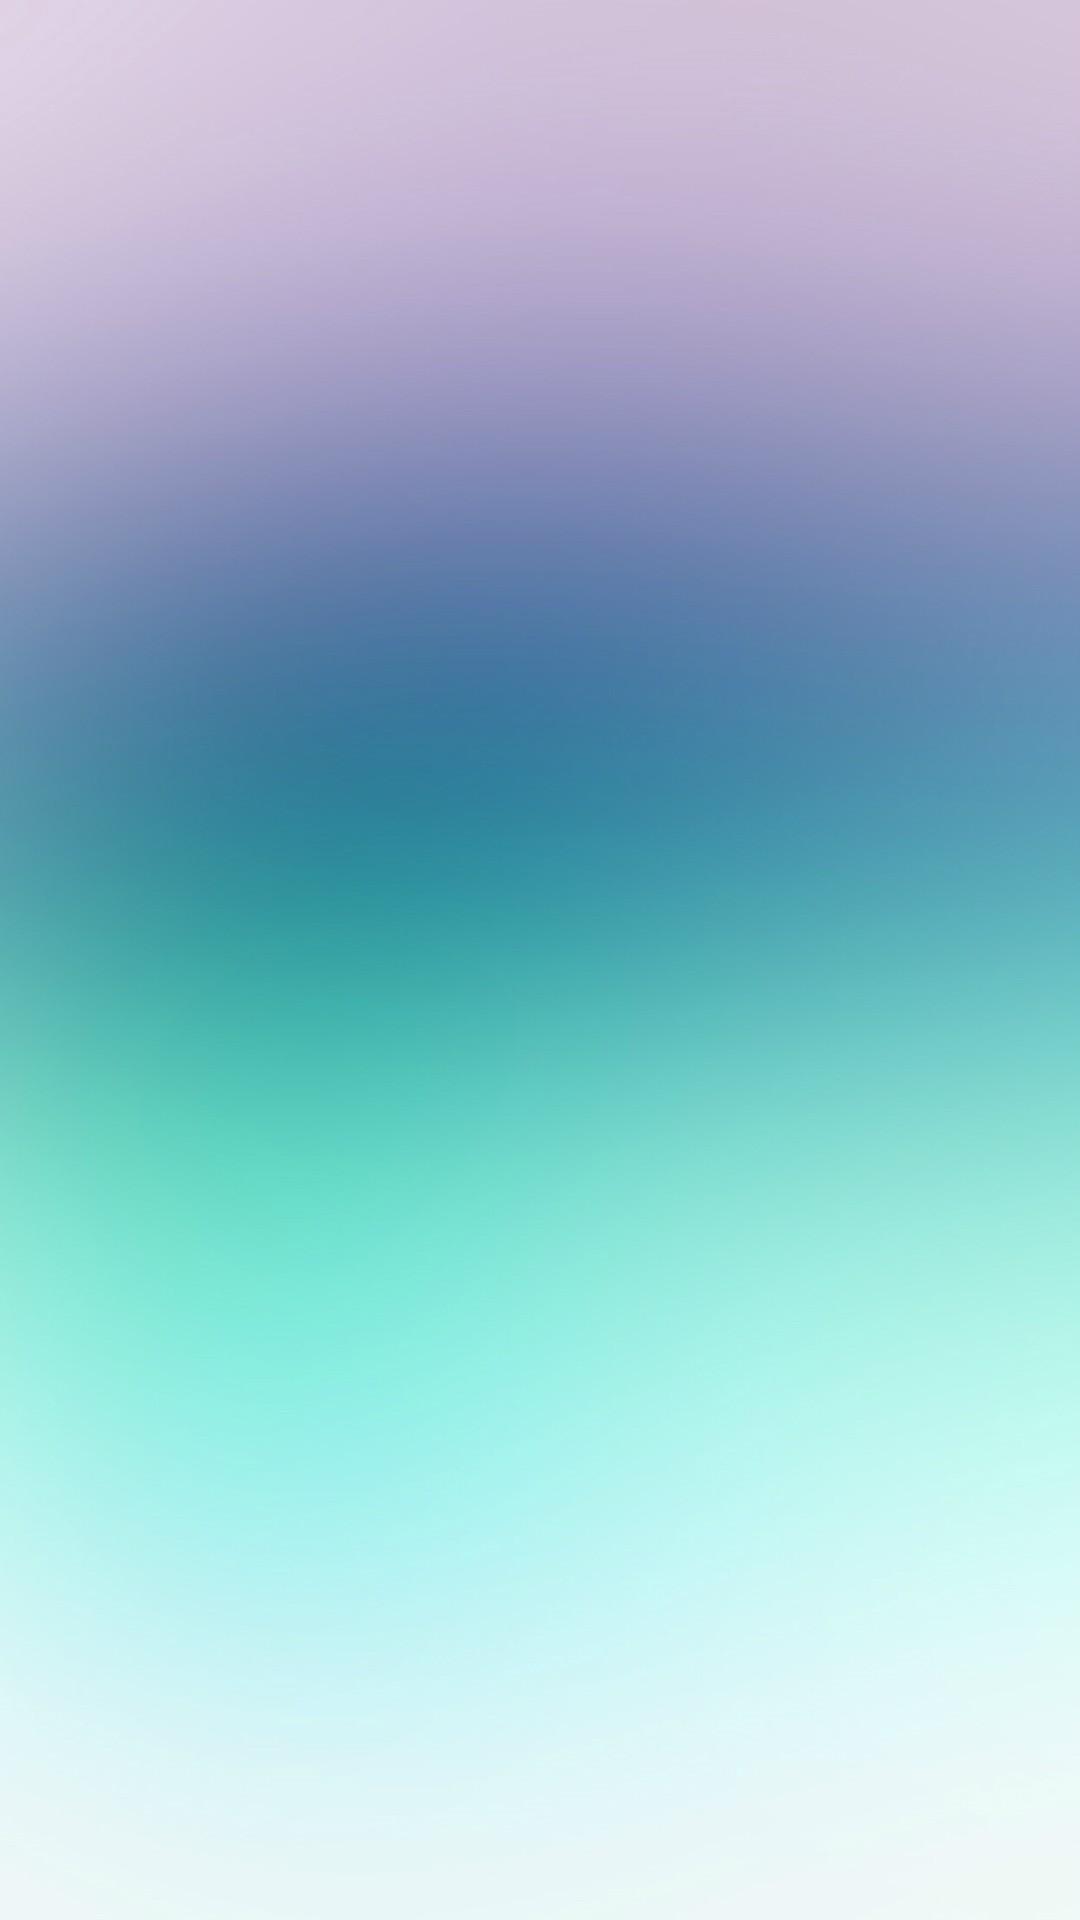 Ombre iPhone hd wallpaper